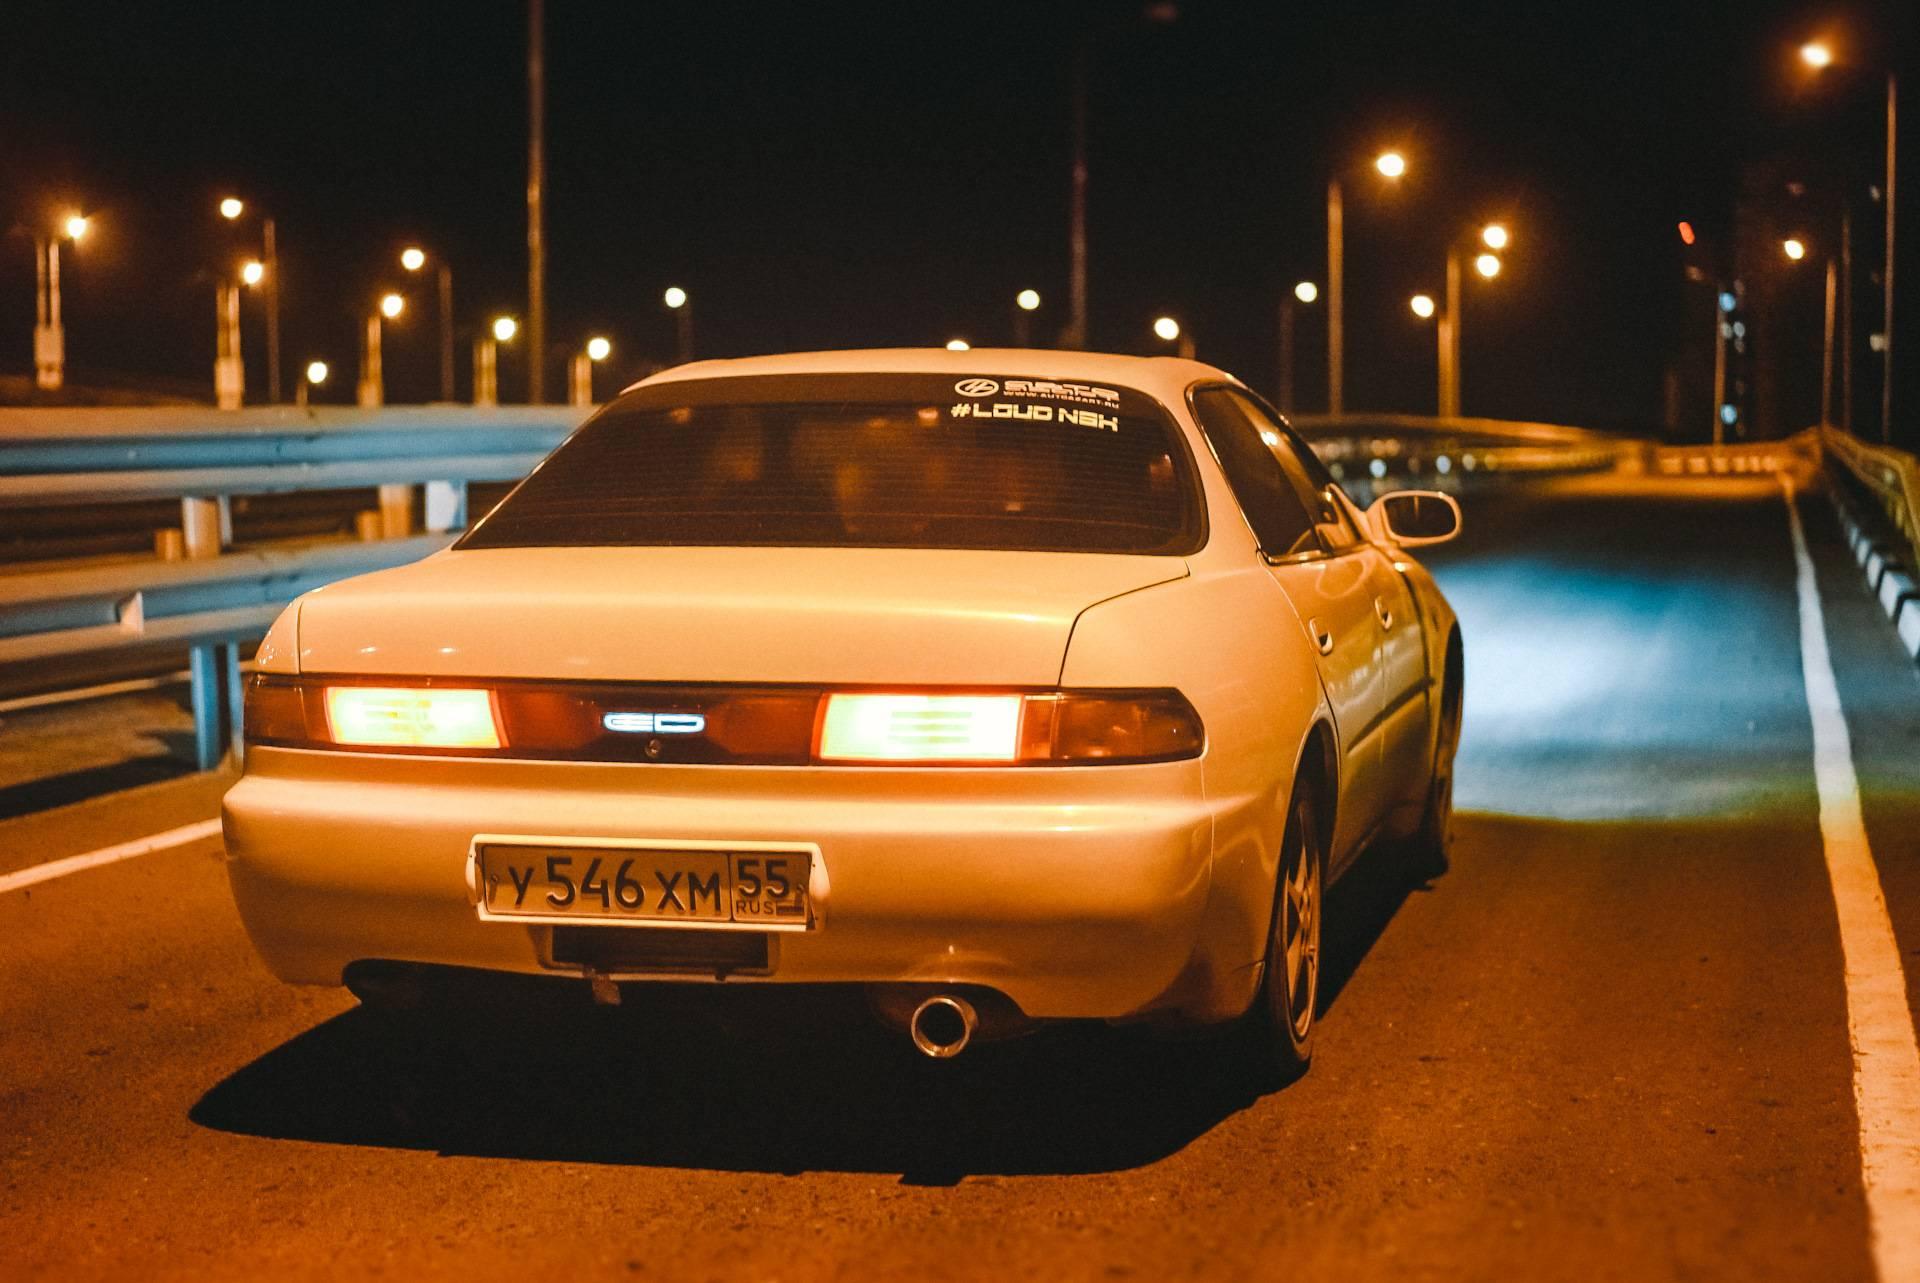 Японский хардтоп: плюсы и минусы Toyota Carina ED III (Т200)